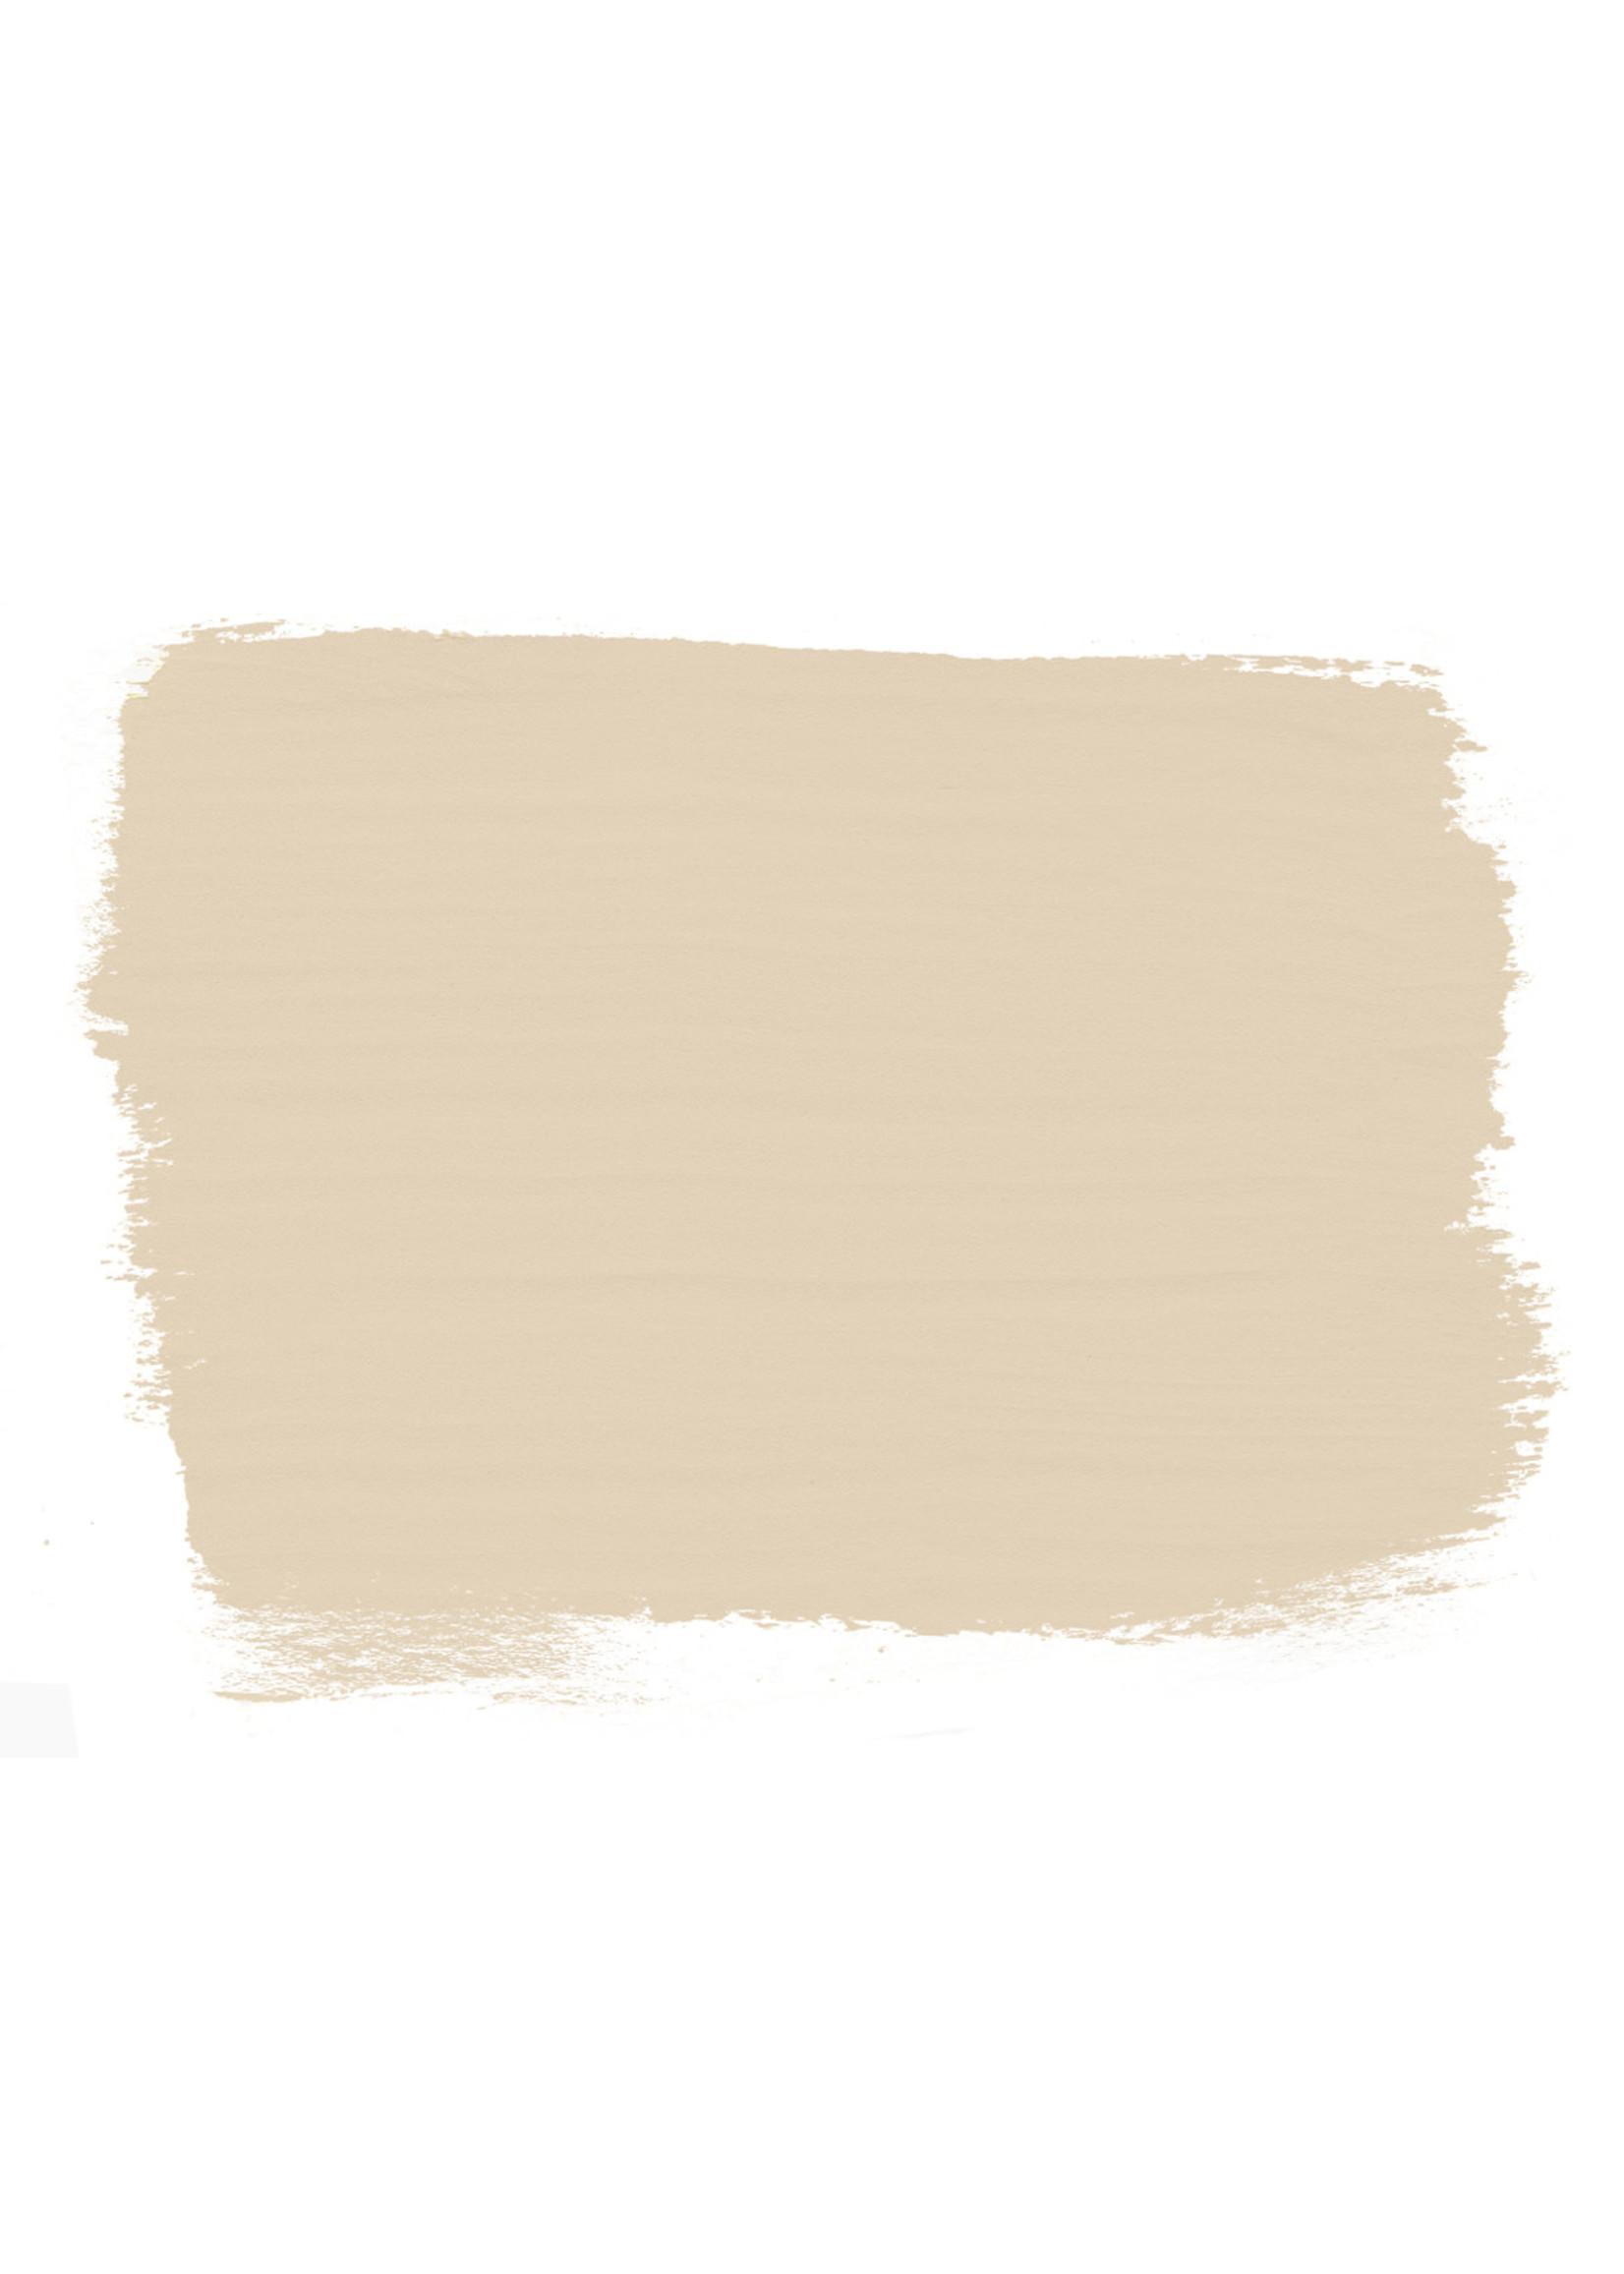 Annie Sloan Chalk Paint® Old Ochre Annie Sloan Chalk Paint®